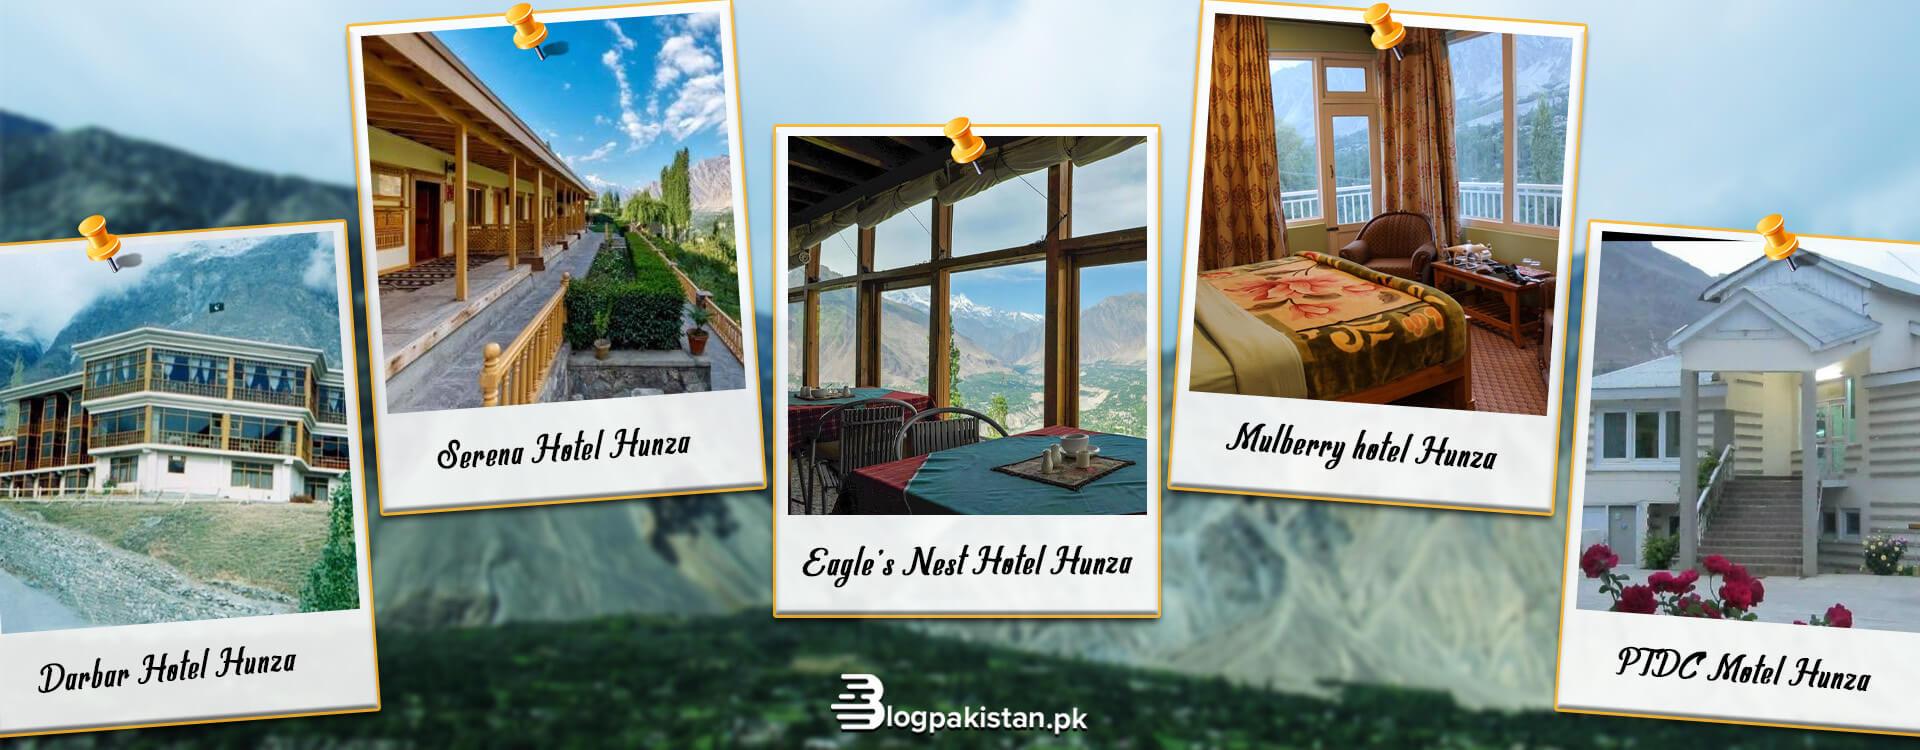 12 Luxury Hotels in Hunza Valley Pakistan: Rent & Contact Details